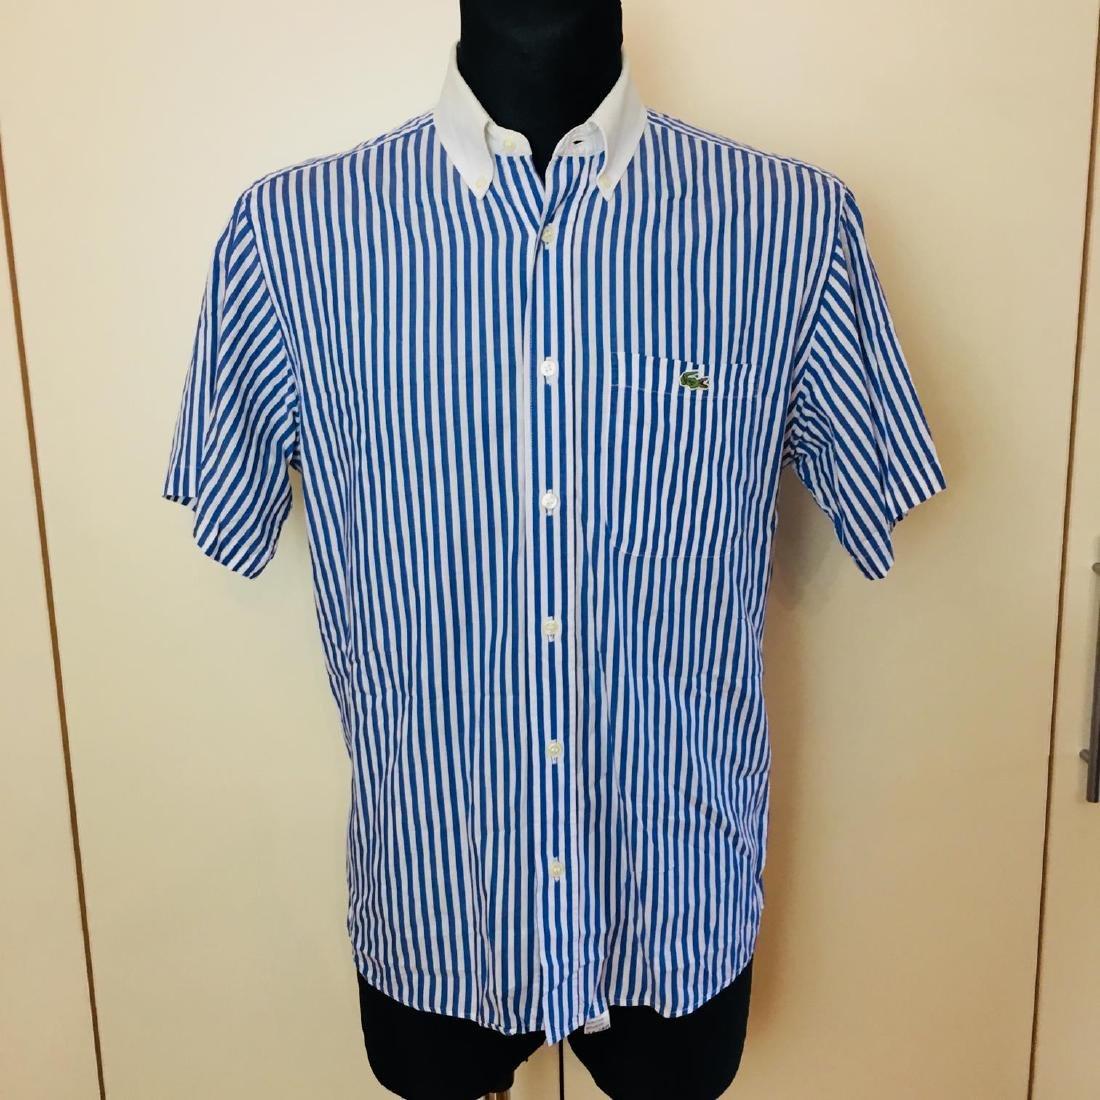 1962bd6392e43 Men's Lacoste Blue Striped Short Sleeve Shirt Size 39 /